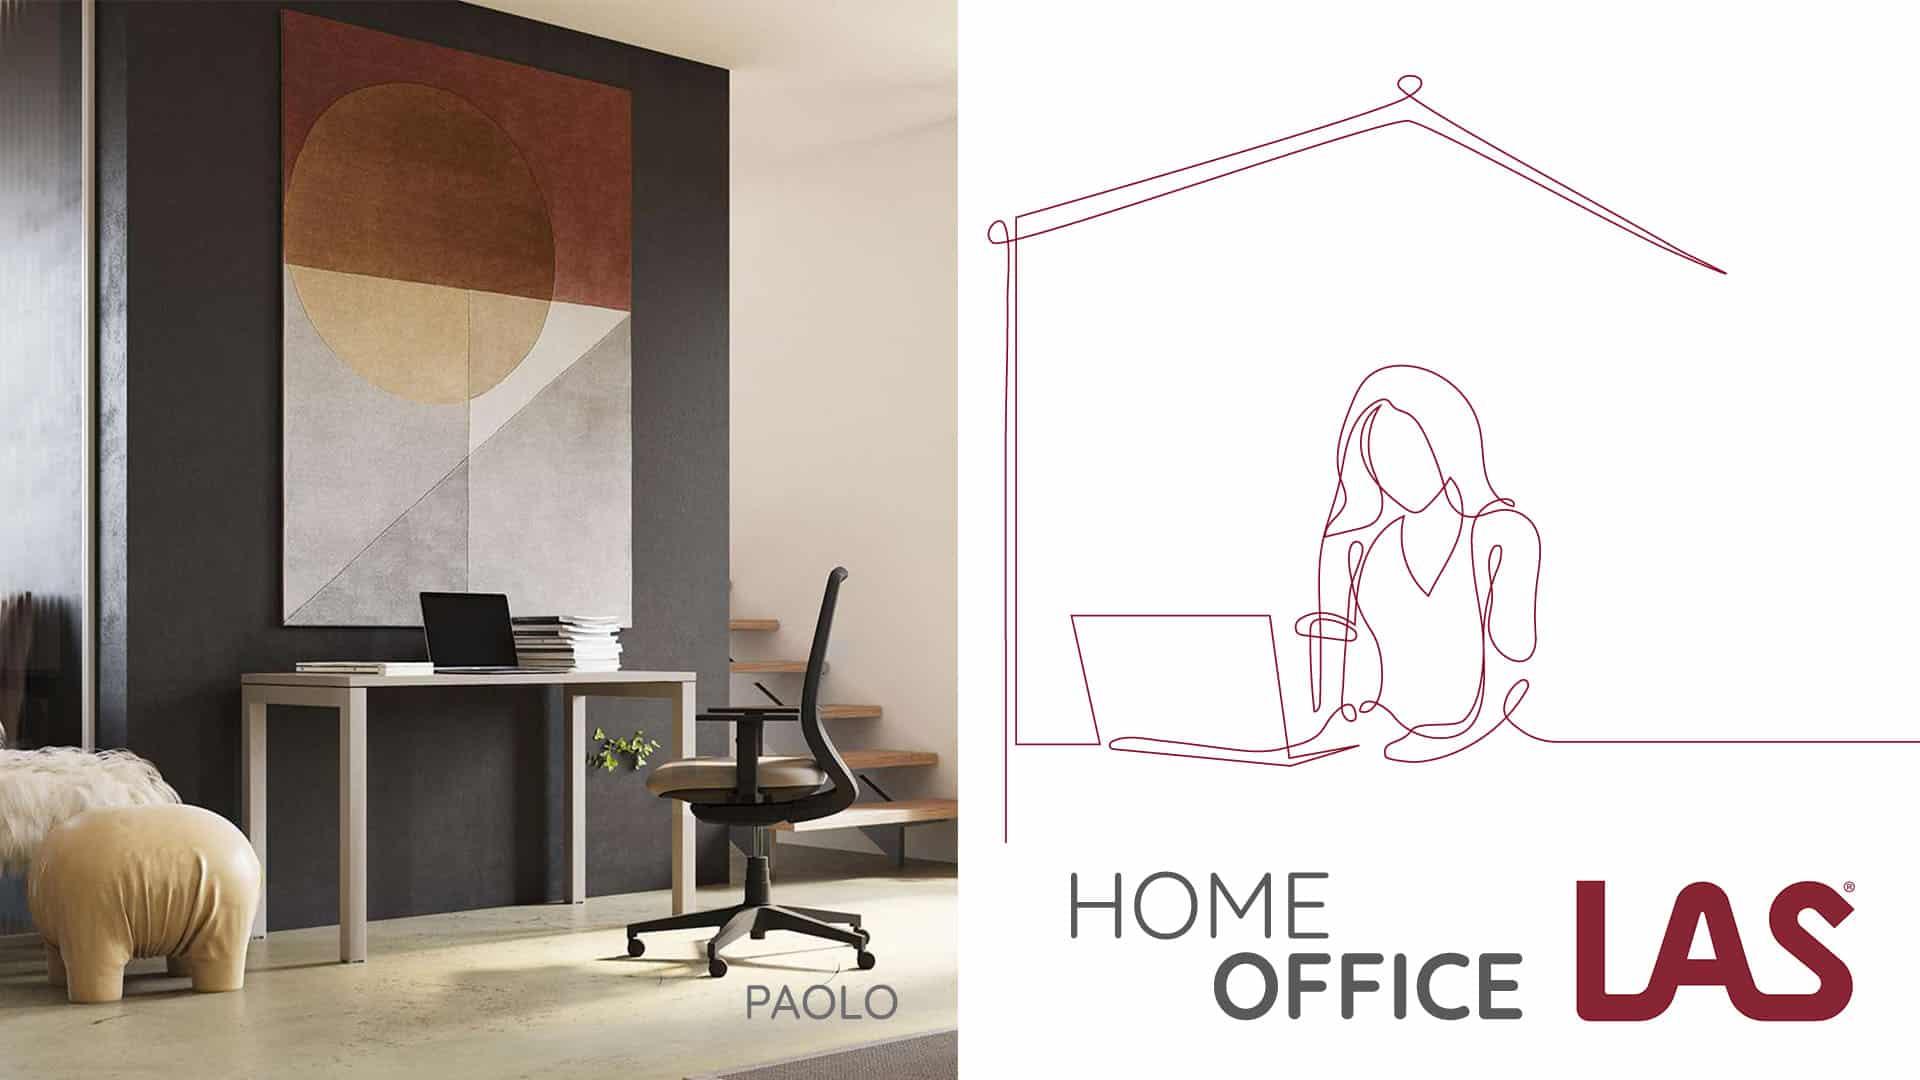 paolo_homeoffice